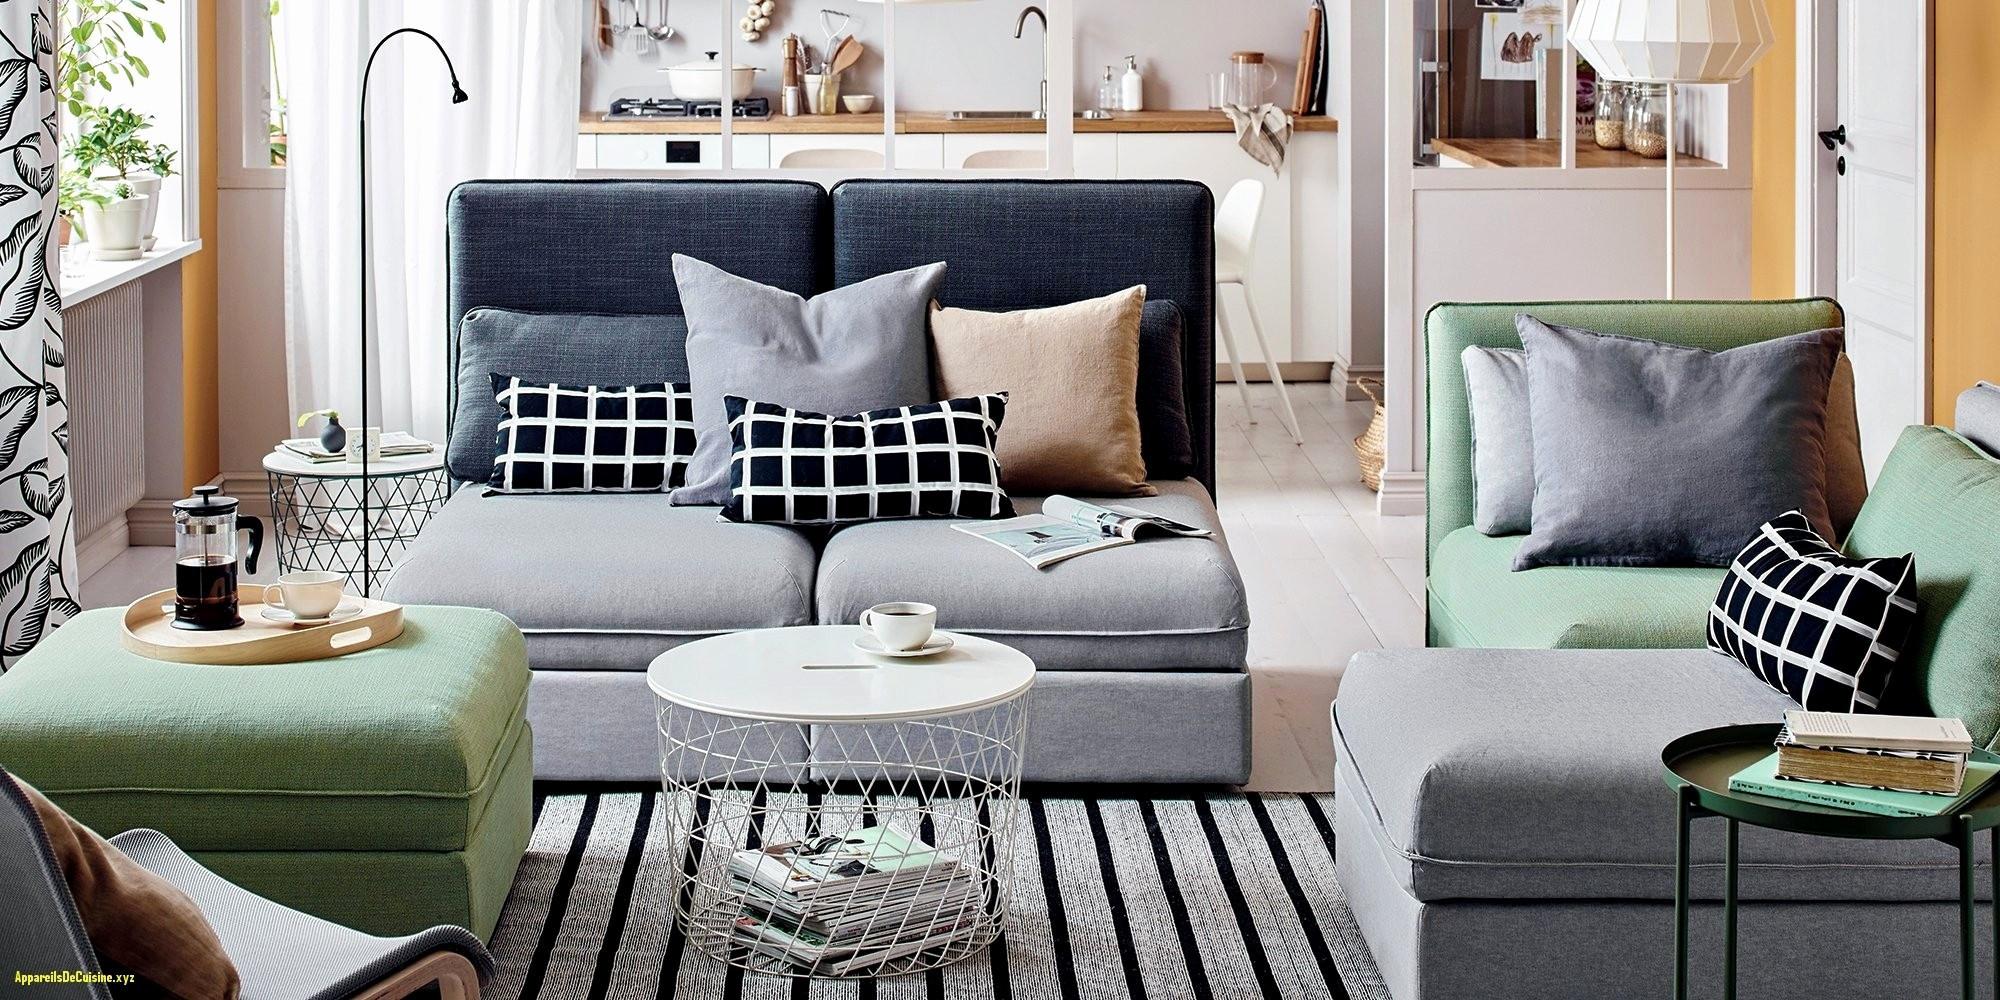 meuble du chalet meubles du chalet meuble du chalet luxe meubles savoyards 0d of meuble du chalet